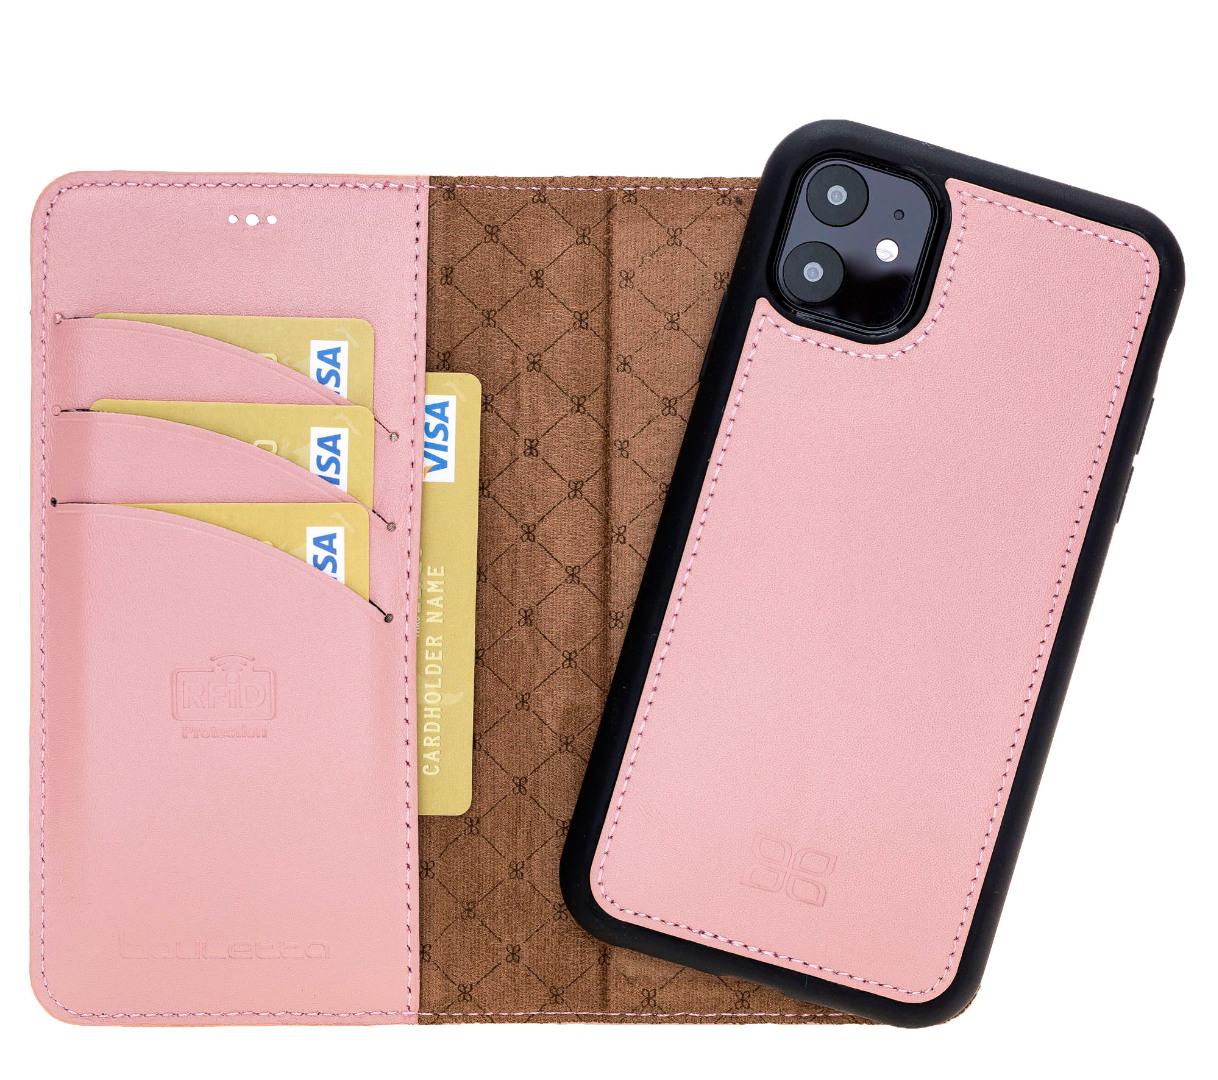 Husa piele naturala 2 in 1, tip portofel + back cover, iPhone 11 - Bouletta Magic Wallet, Roz nude